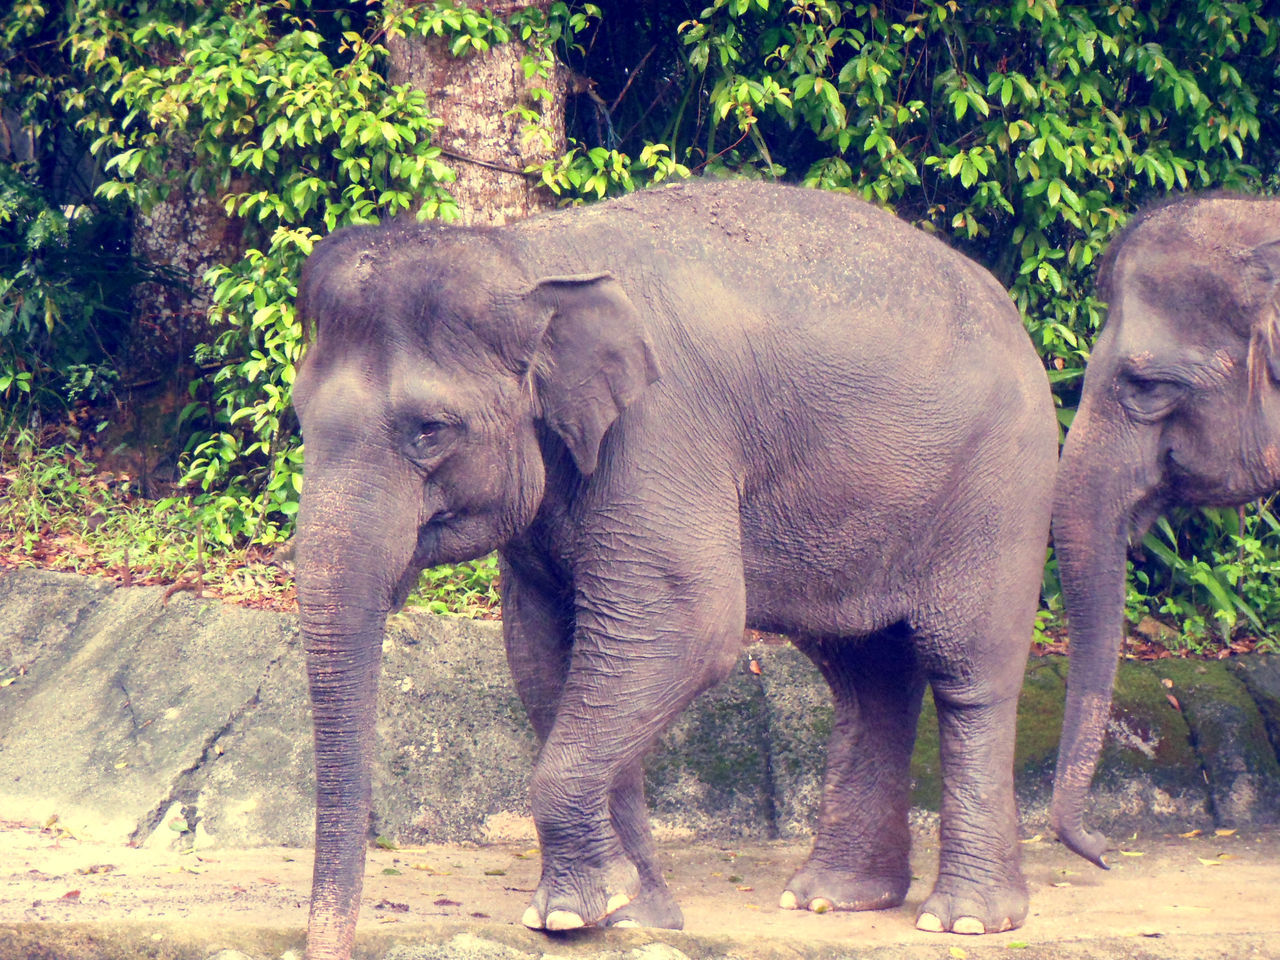 Animal Animal Themes Animal Wildlife Animals In The Wild DUMBO Elephant Indian Elephant Mammal Singapore Zoological Garden Togetherness Young Animal